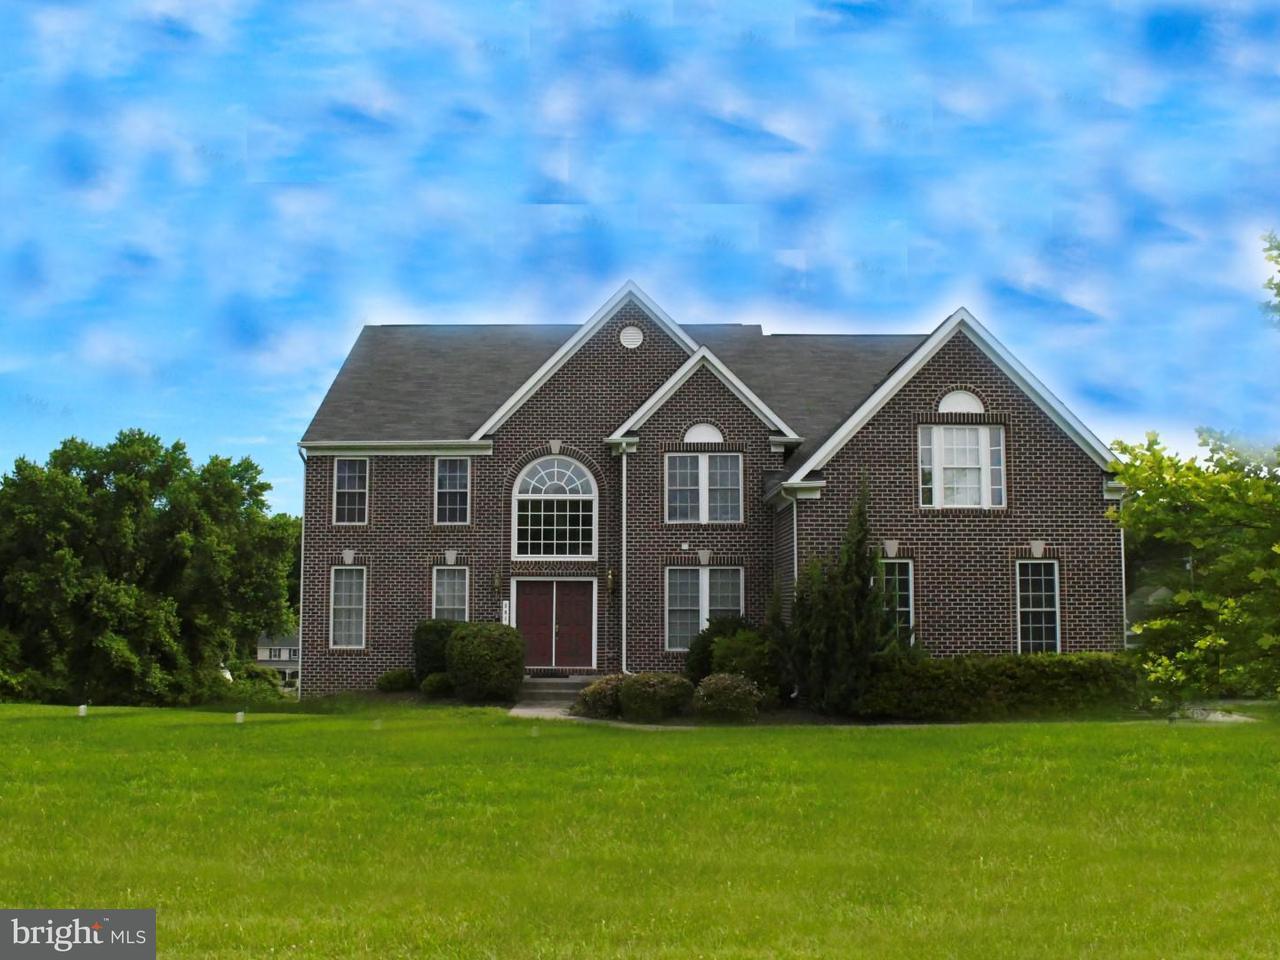 Villa per Vendita alle ore 3014 EDRICH WAY 3014 EDRICH WAY Randallstown, Maryland 21133 Stati Uniti